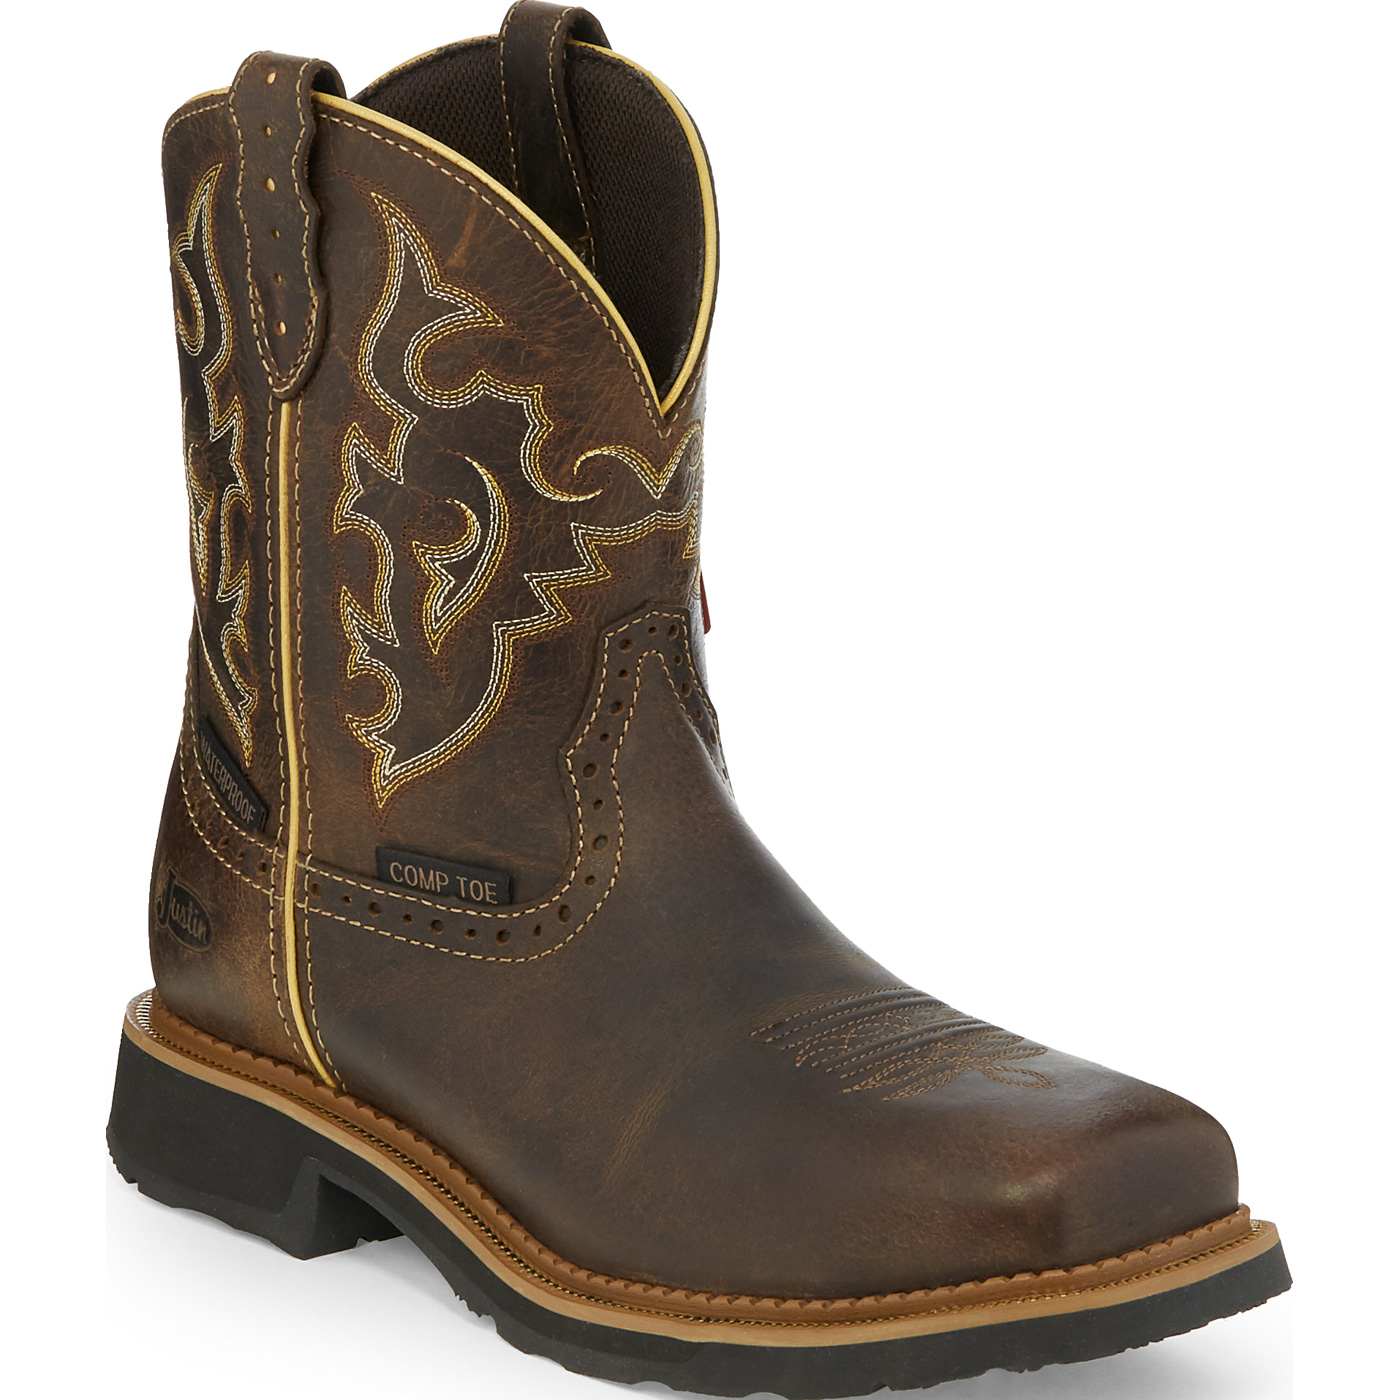 Justin Work Gypsy Women s 8 inch Composite Toe Electrical Hazard Waterproof  Pull-on Western Work BootJustin Work Gypsy Women s 8 inch Composite Toe ... 79c2b694f6